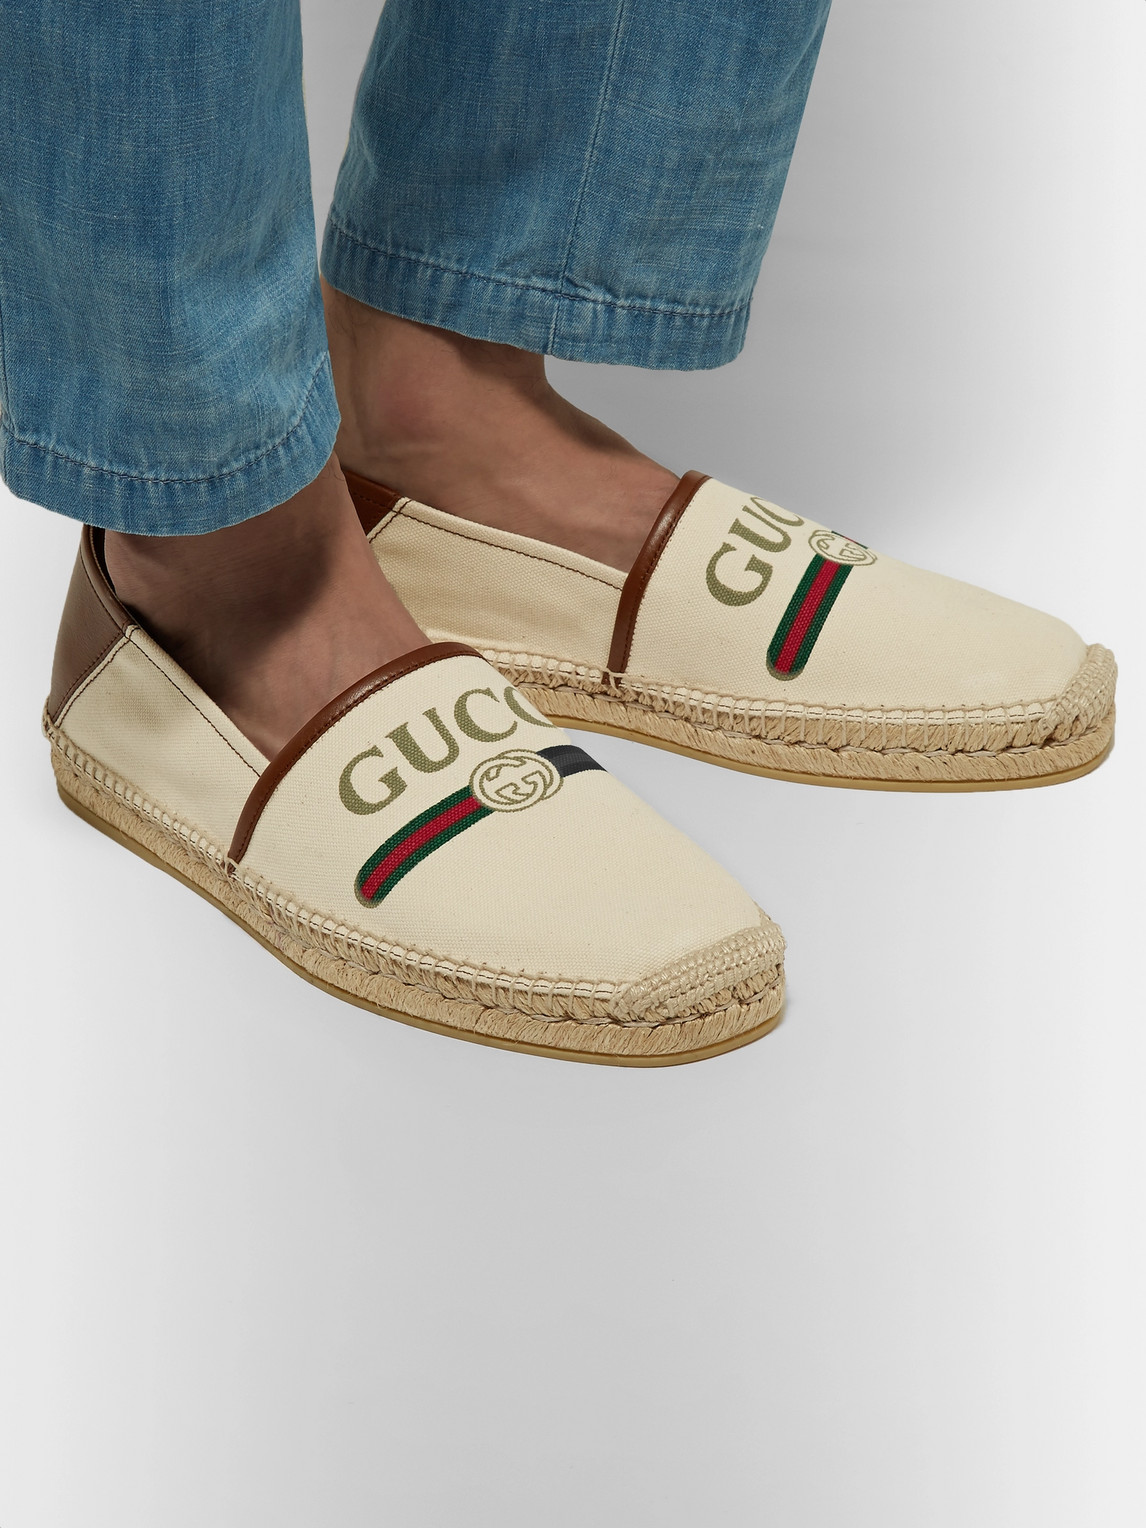 Gucci Shoes ALEJANDRO COLLAPSIBLE-HEEL LOGO-PRINT CANVAS ESPADRILLES